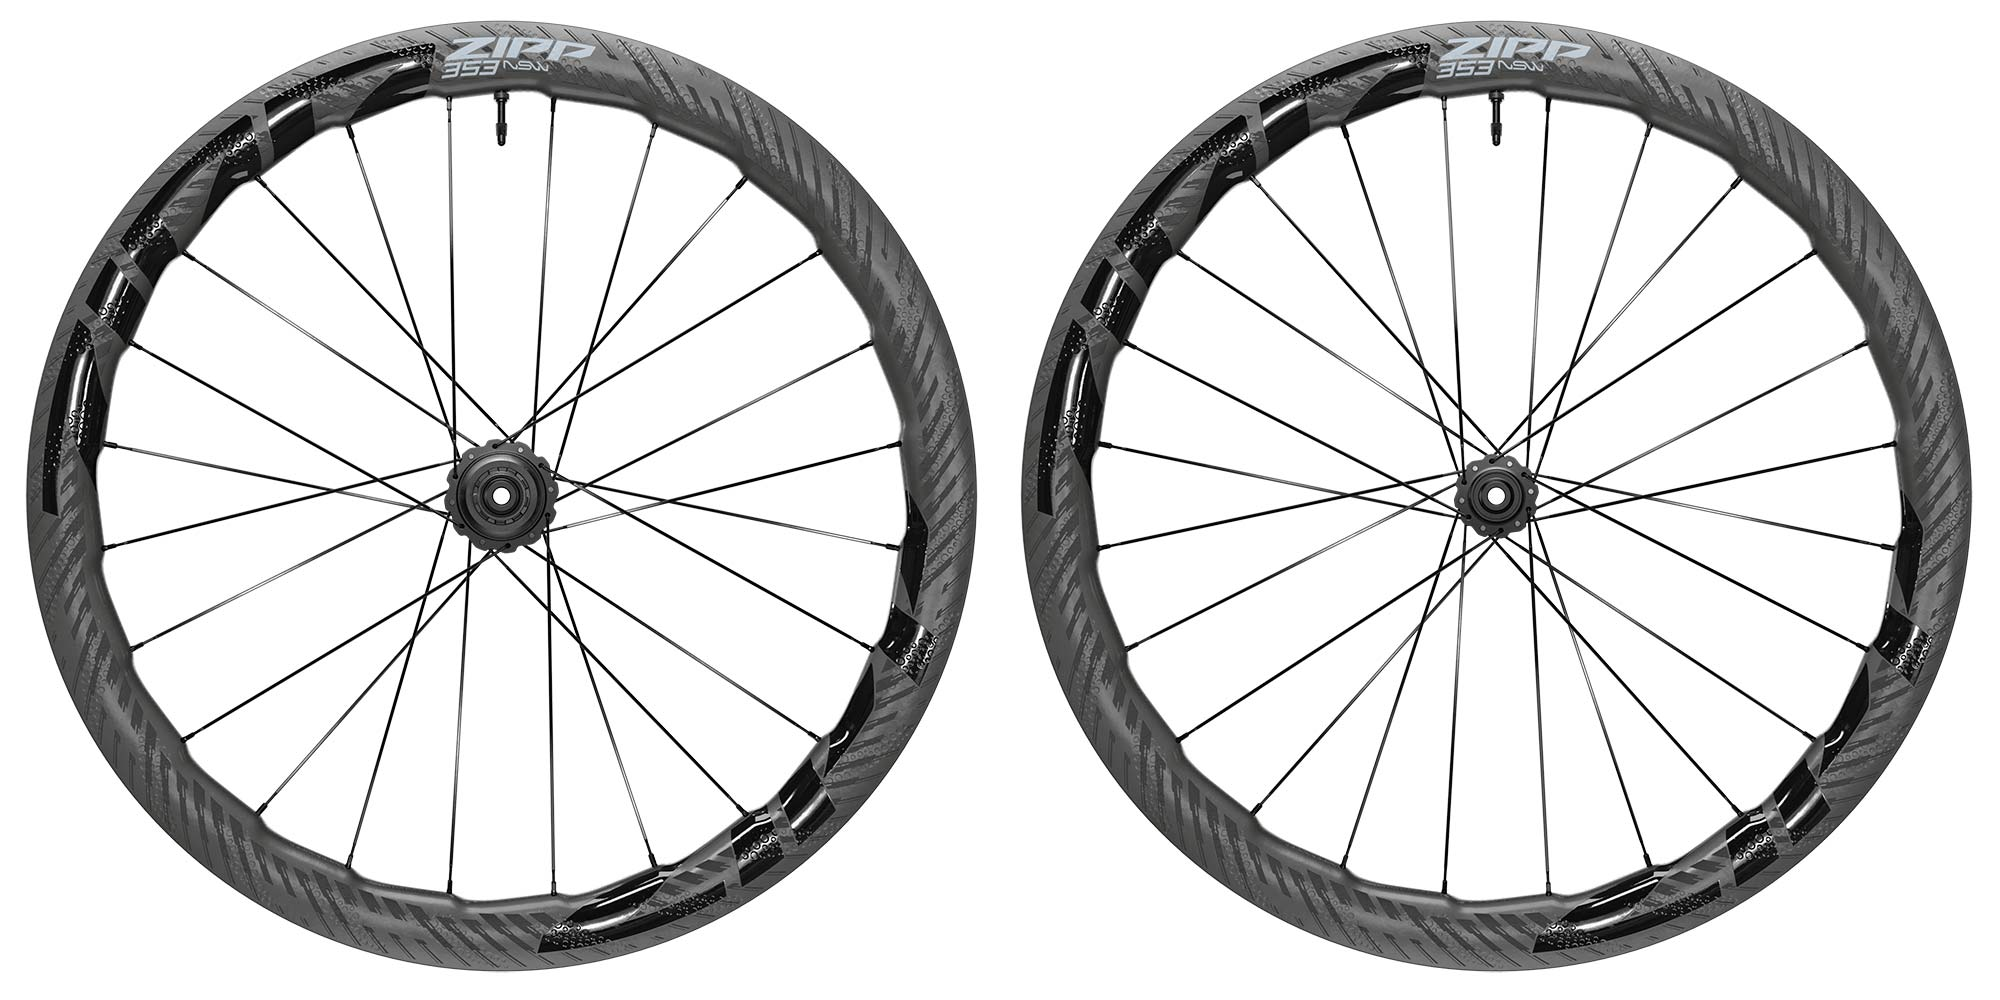 Zipp 353 NSW tubeless wheels, ultra-wide 25mm internal hookless tubeless carbon disc brake road bike wheelset,pair